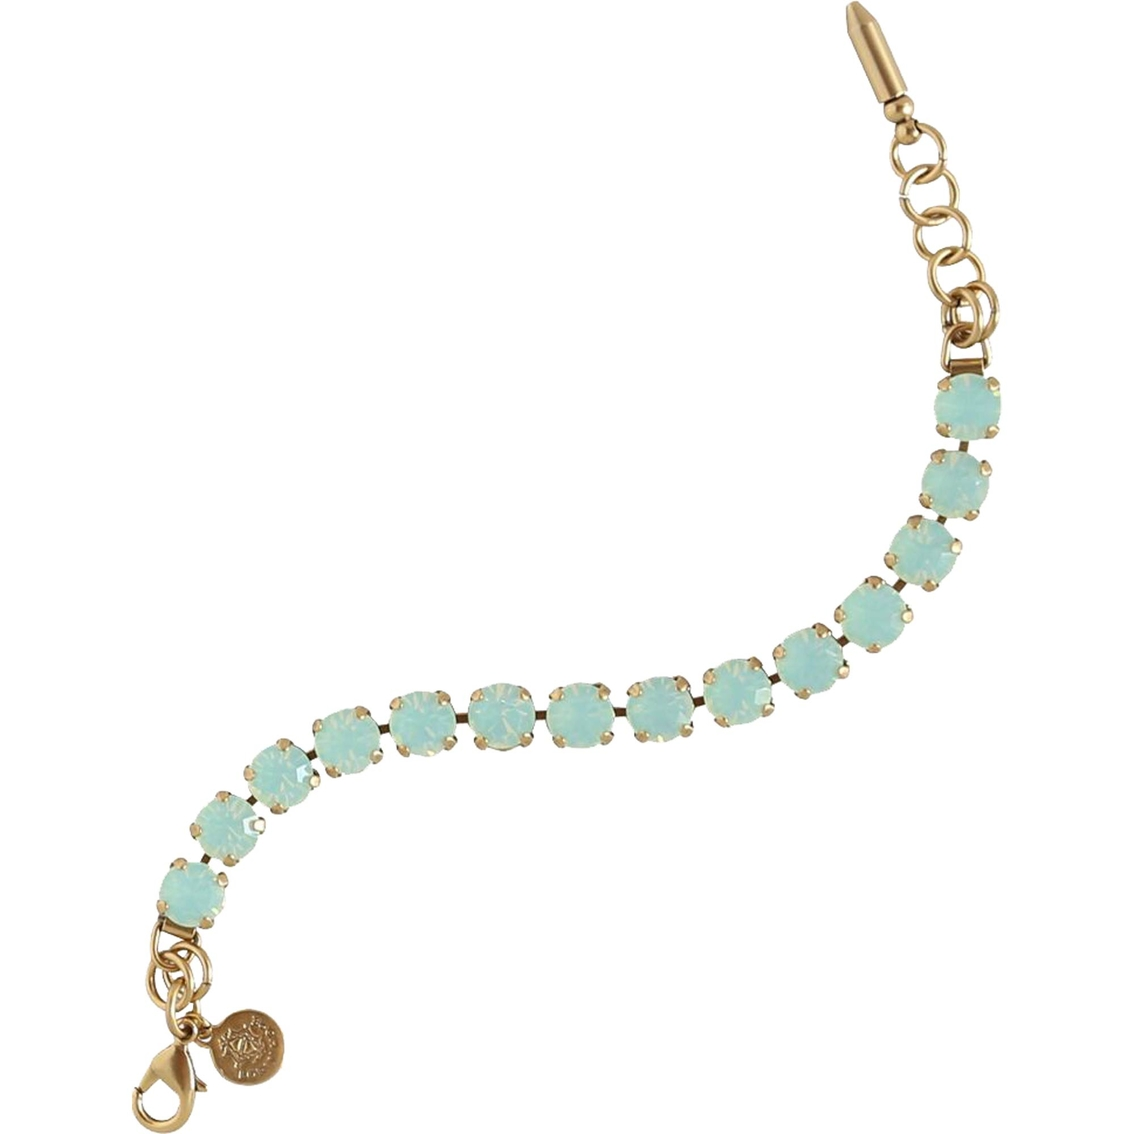 Loren Hope Arista Bracelet Fashion